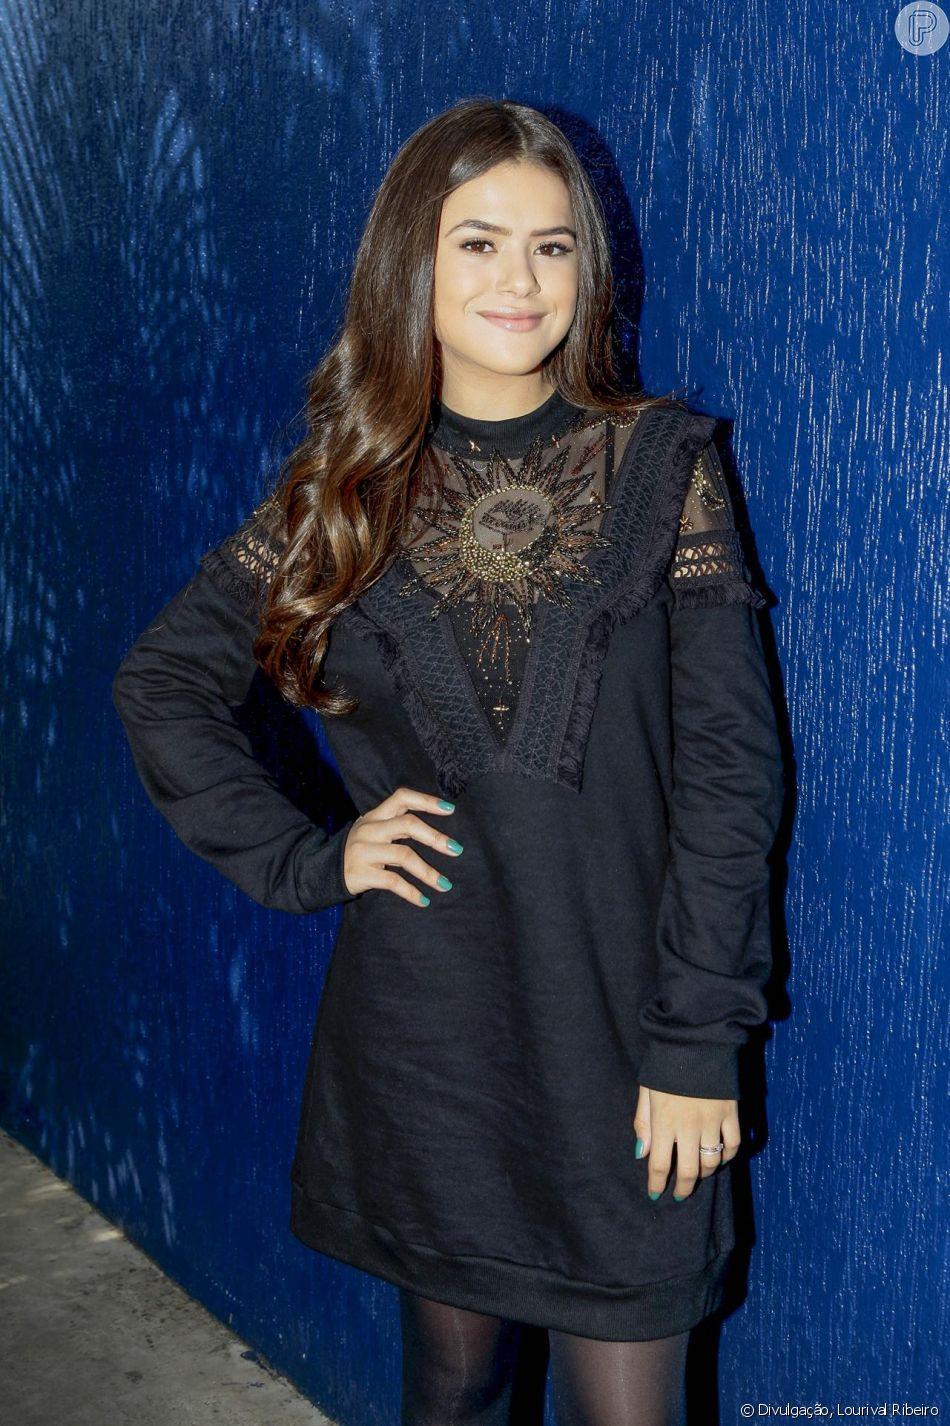 Após 11 anos de SBT, Maisa vai estrelar seu primeiro talk-show na TV aos 16